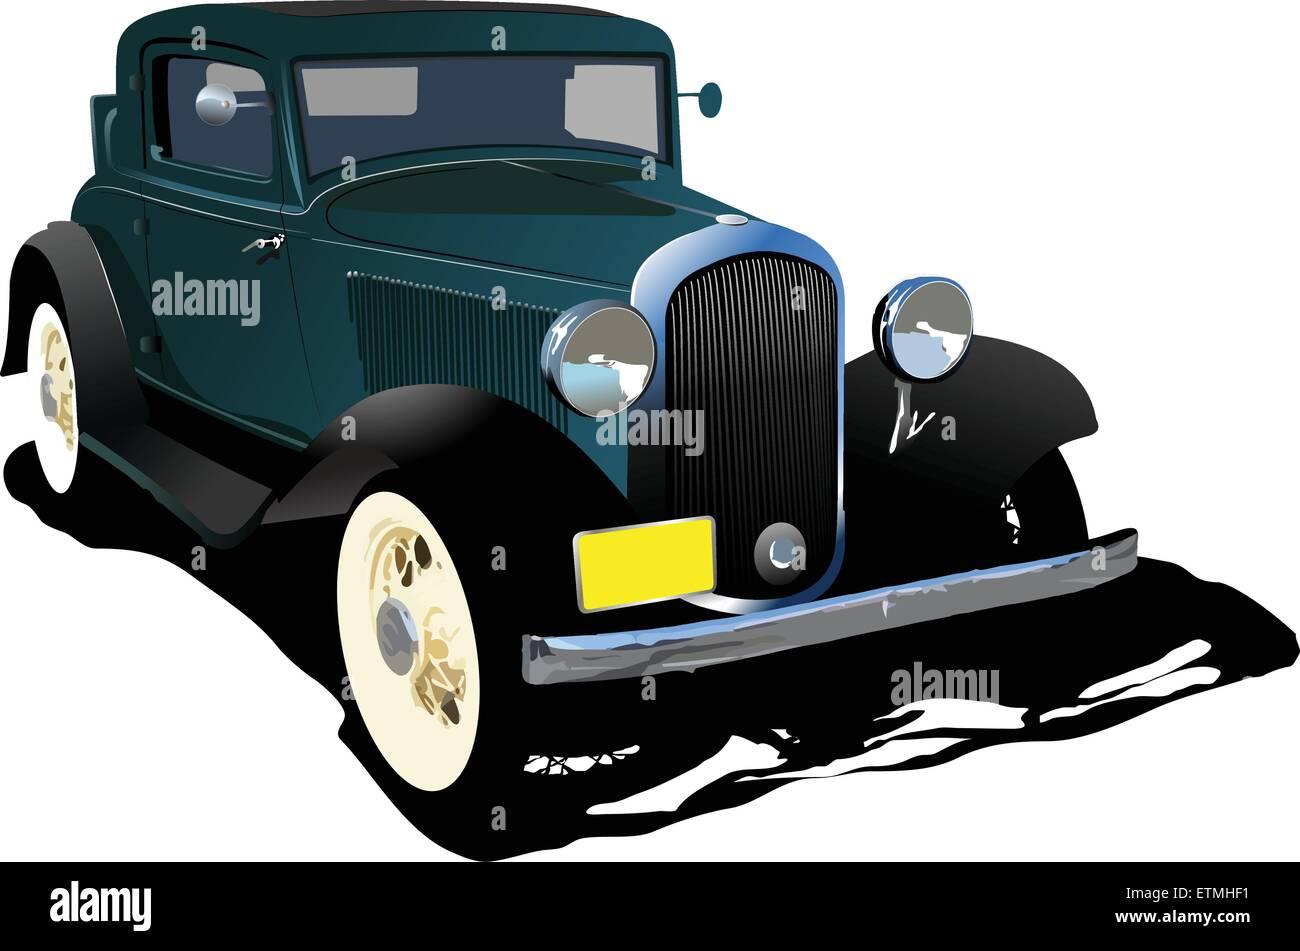 Old green cab. Vector illustration - Stock Vector